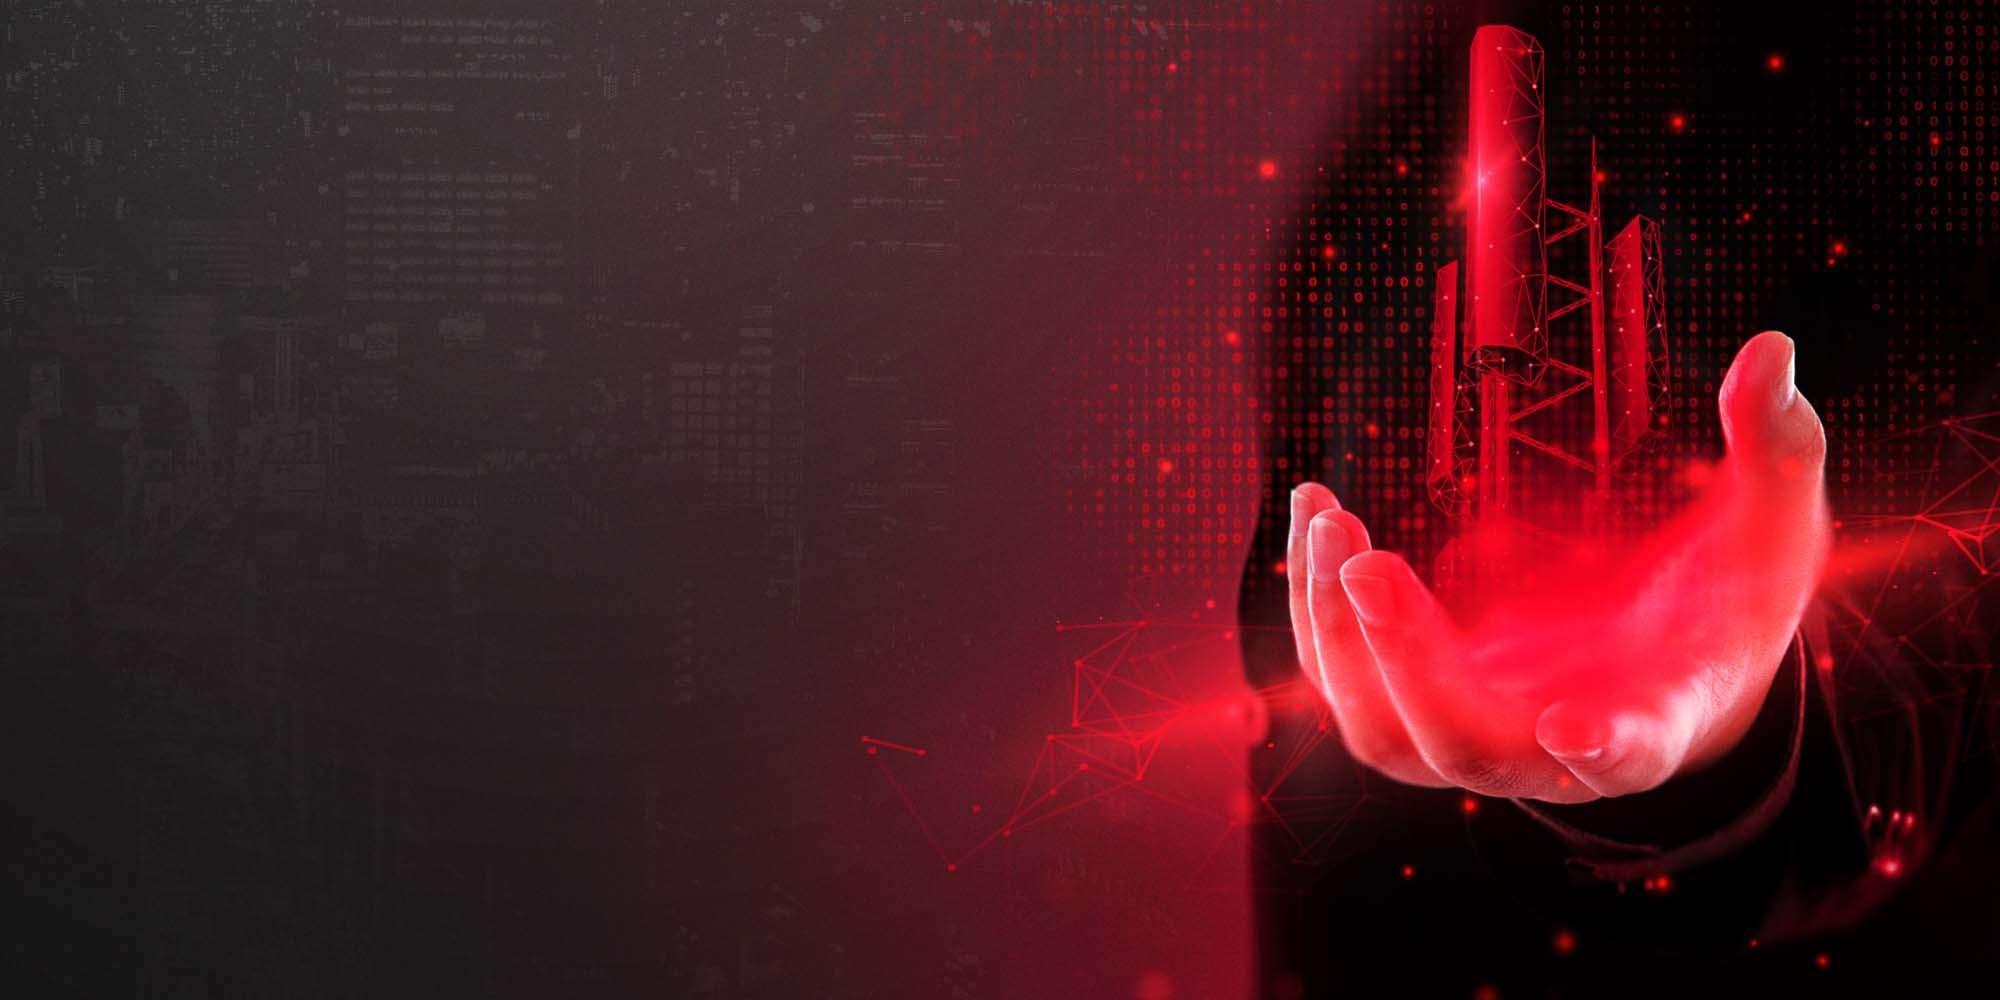 Off Net Bypass Fraud - SIM Box Fraud